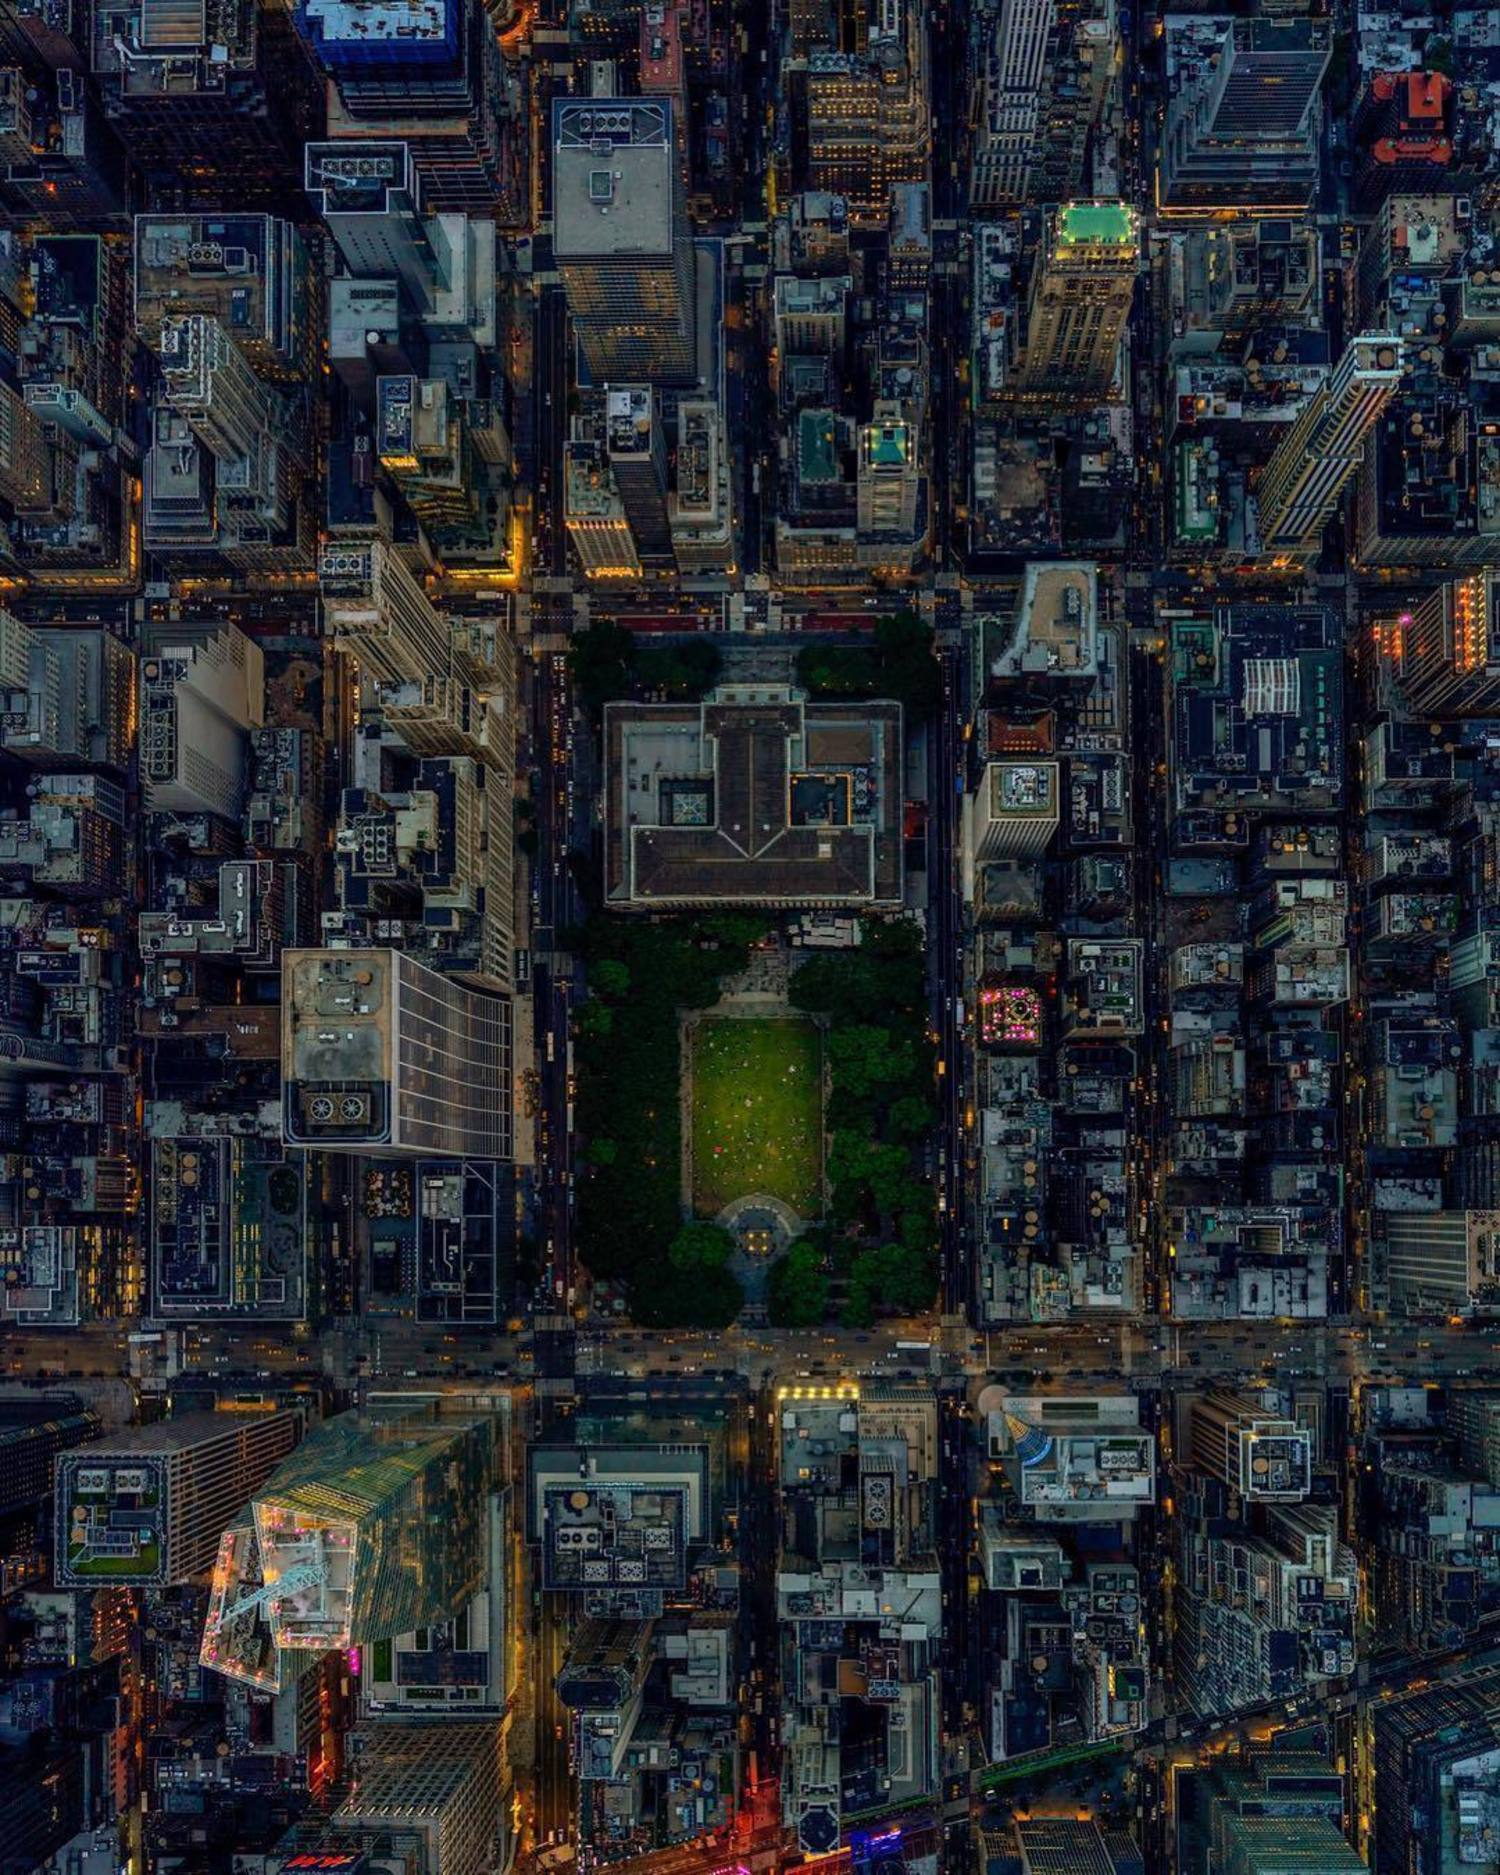 Bryant Park, Manhattan. Photo via @jeffreymilstein #viewingnyc #newyork #newyorkcity #nyc #bryantpark